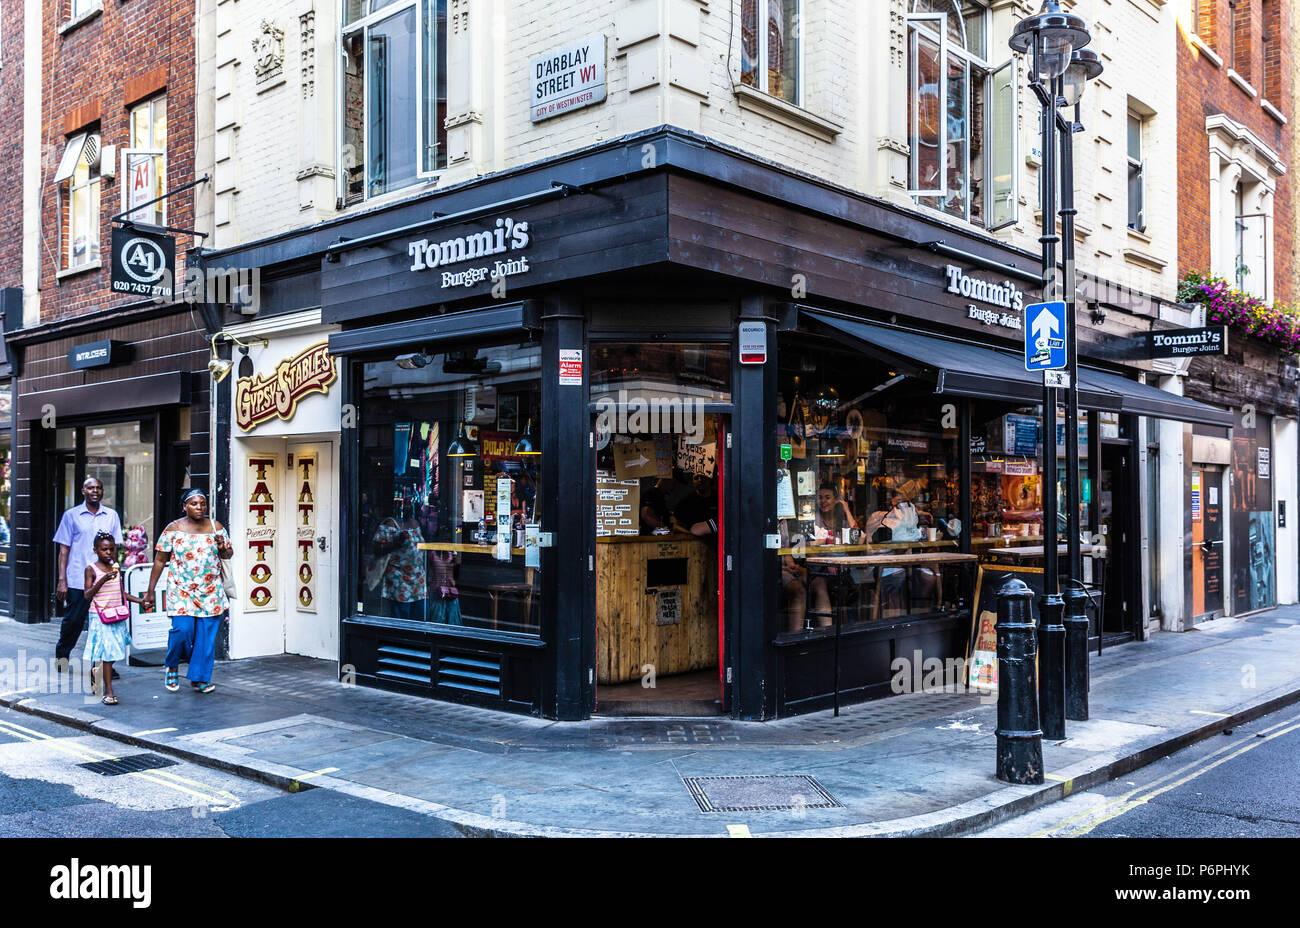 Tommi's Burger Joint, on the corner of D'Arblay Street and Wardour Street, Soho, London, W1, England, UK. - Stock Image